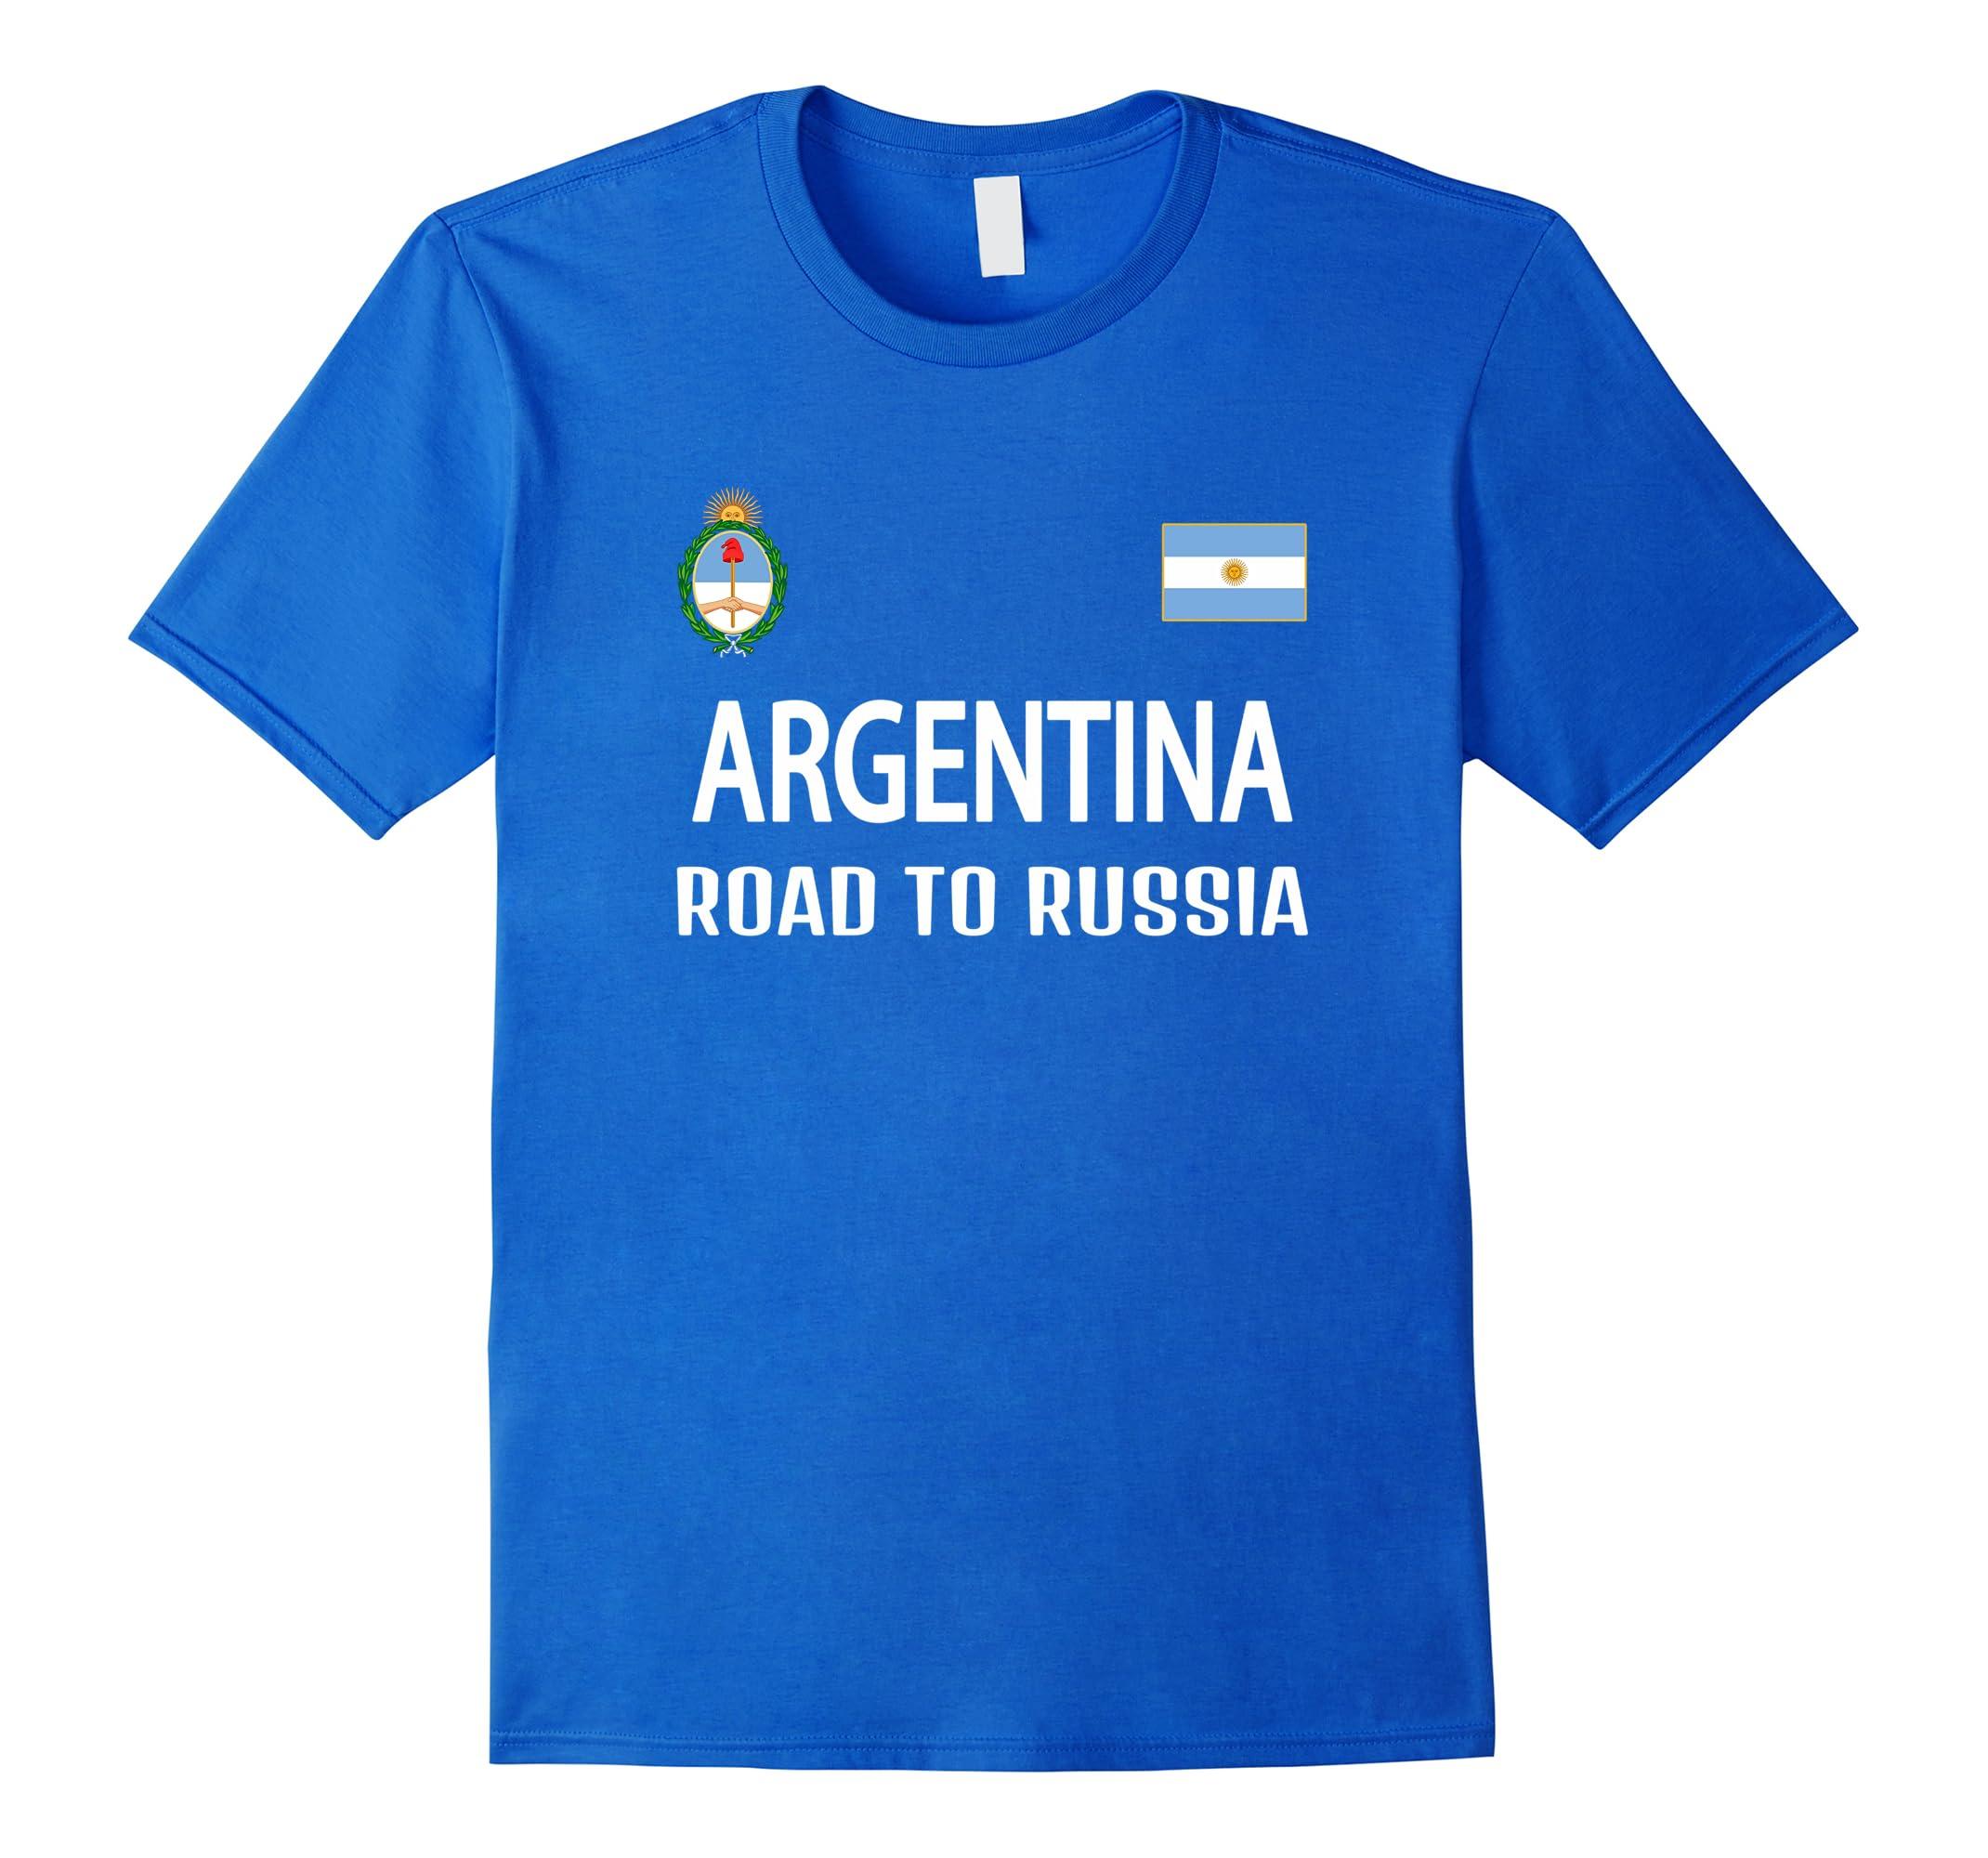 Argentina road to Russia T-shirt Men Women Kids Soccer-RT